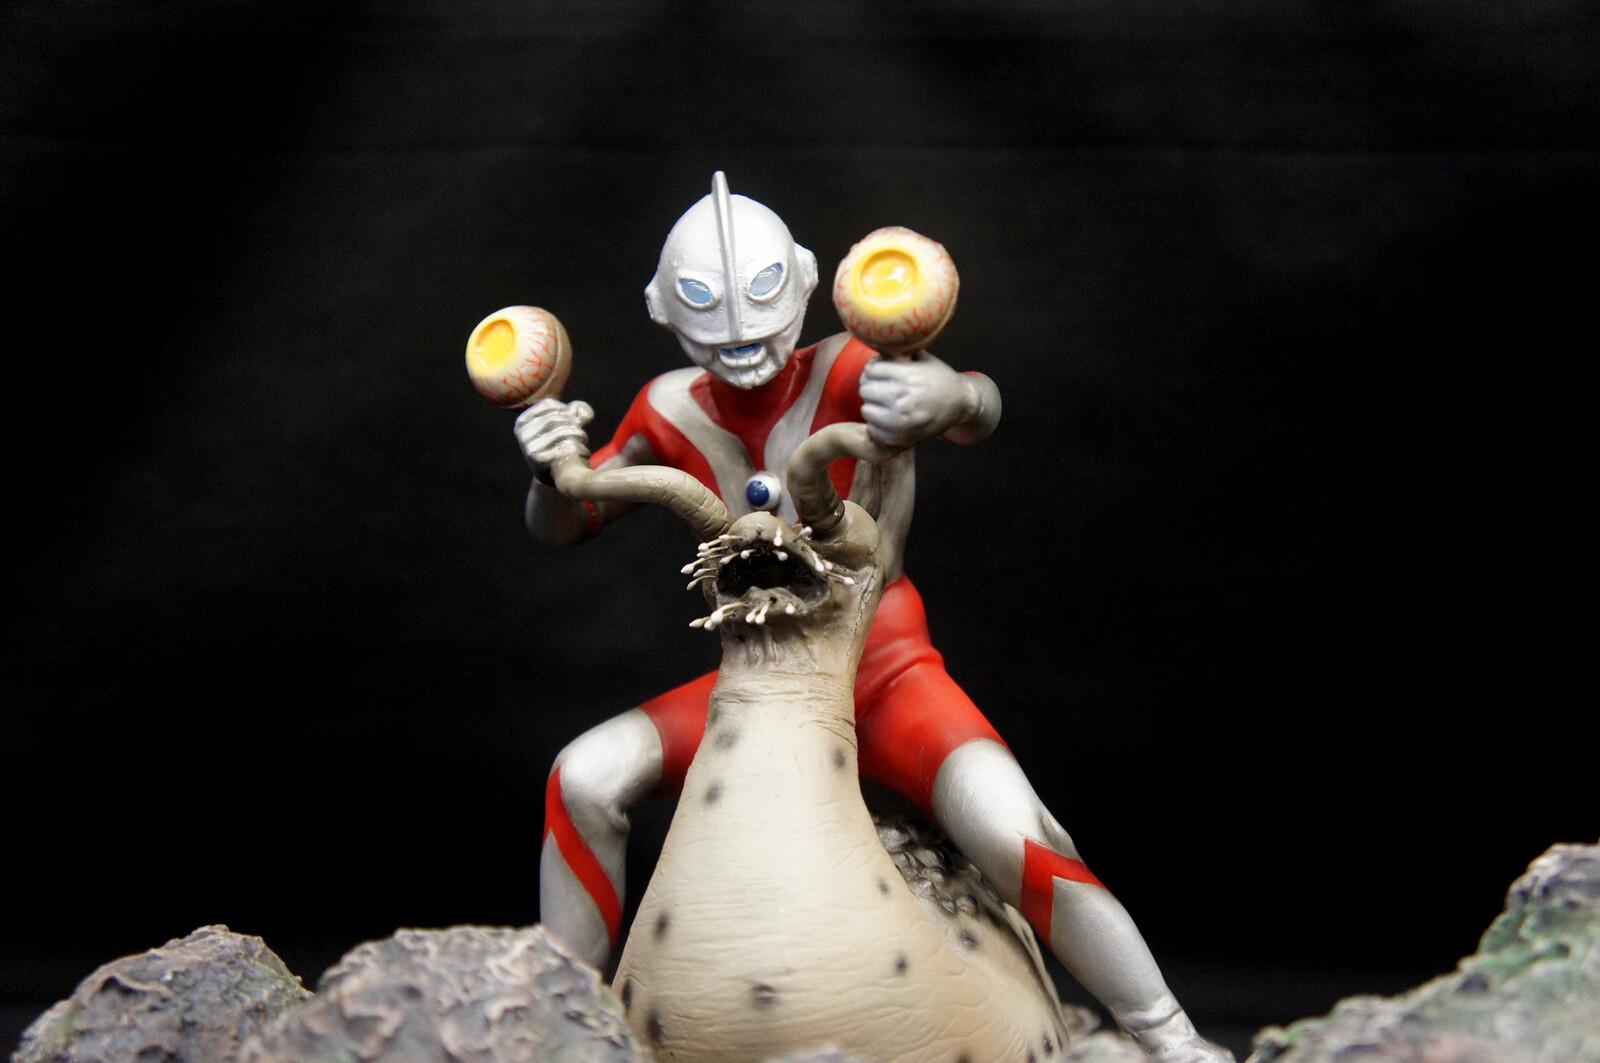 Namegon vs Ultraman Art Statue ナメゴン対ウルトラマン  https://www.solidart.club/